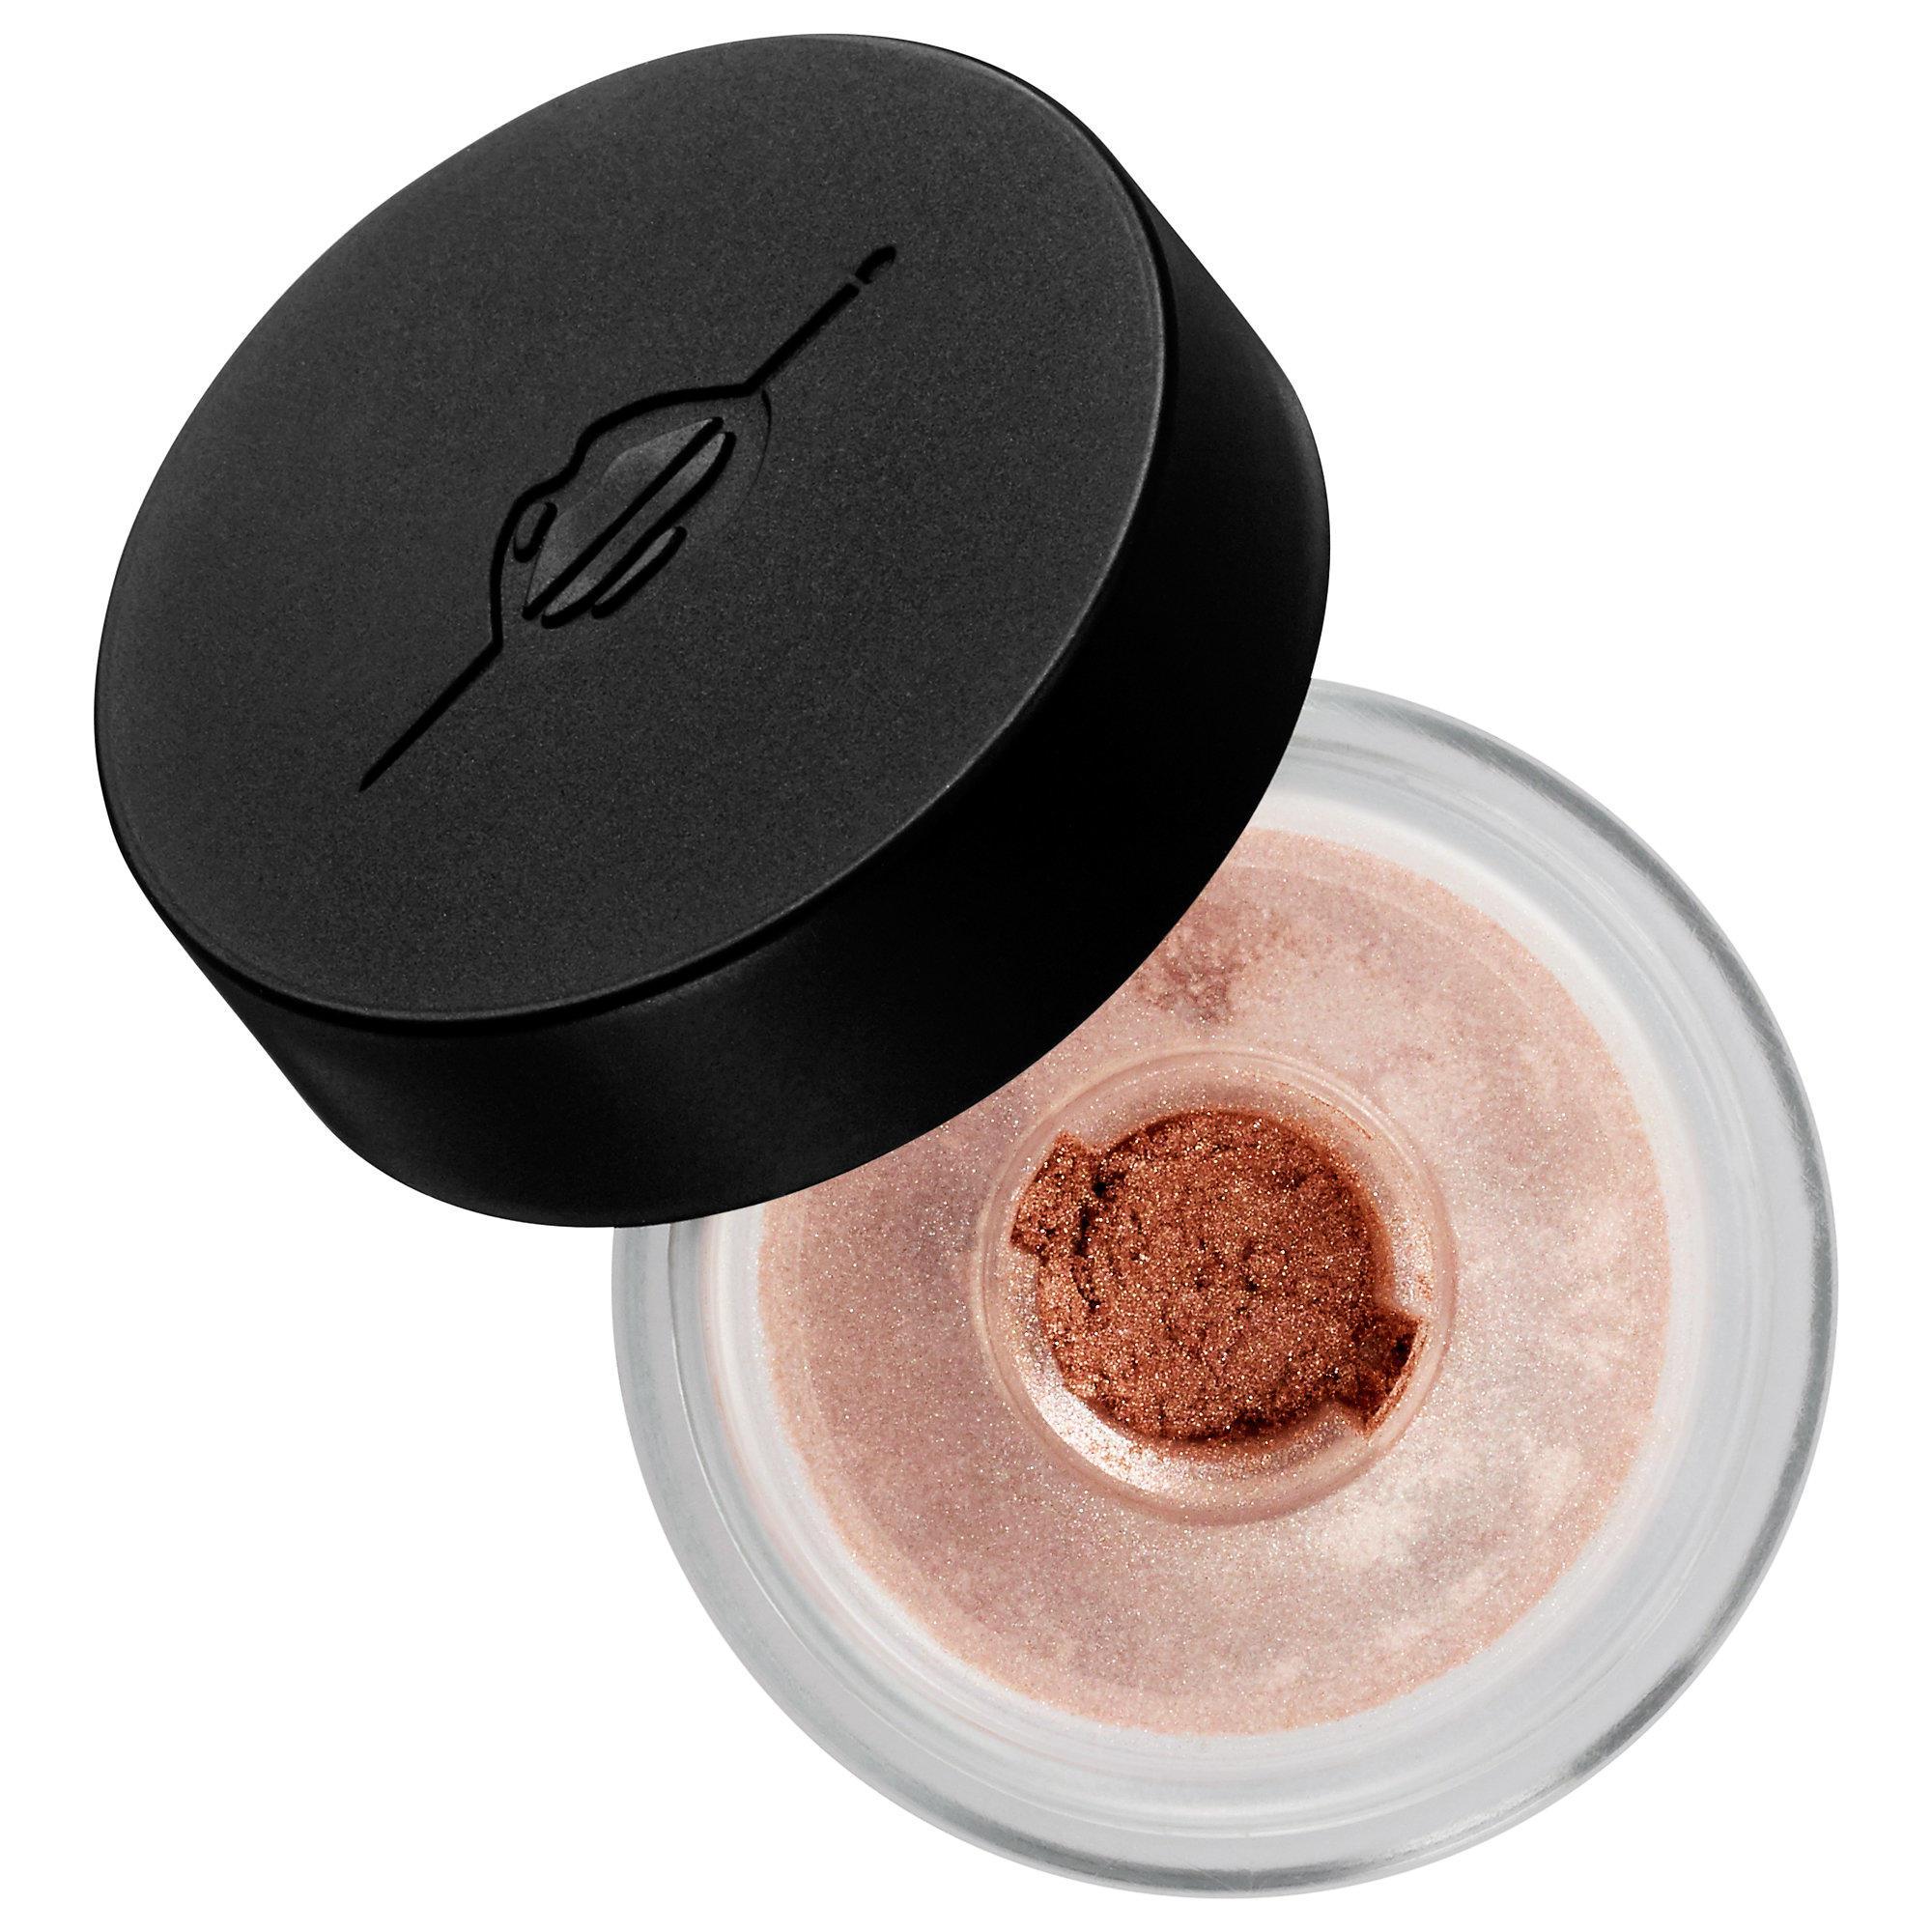 Makeup Forever Star Lit Powder Copper 12